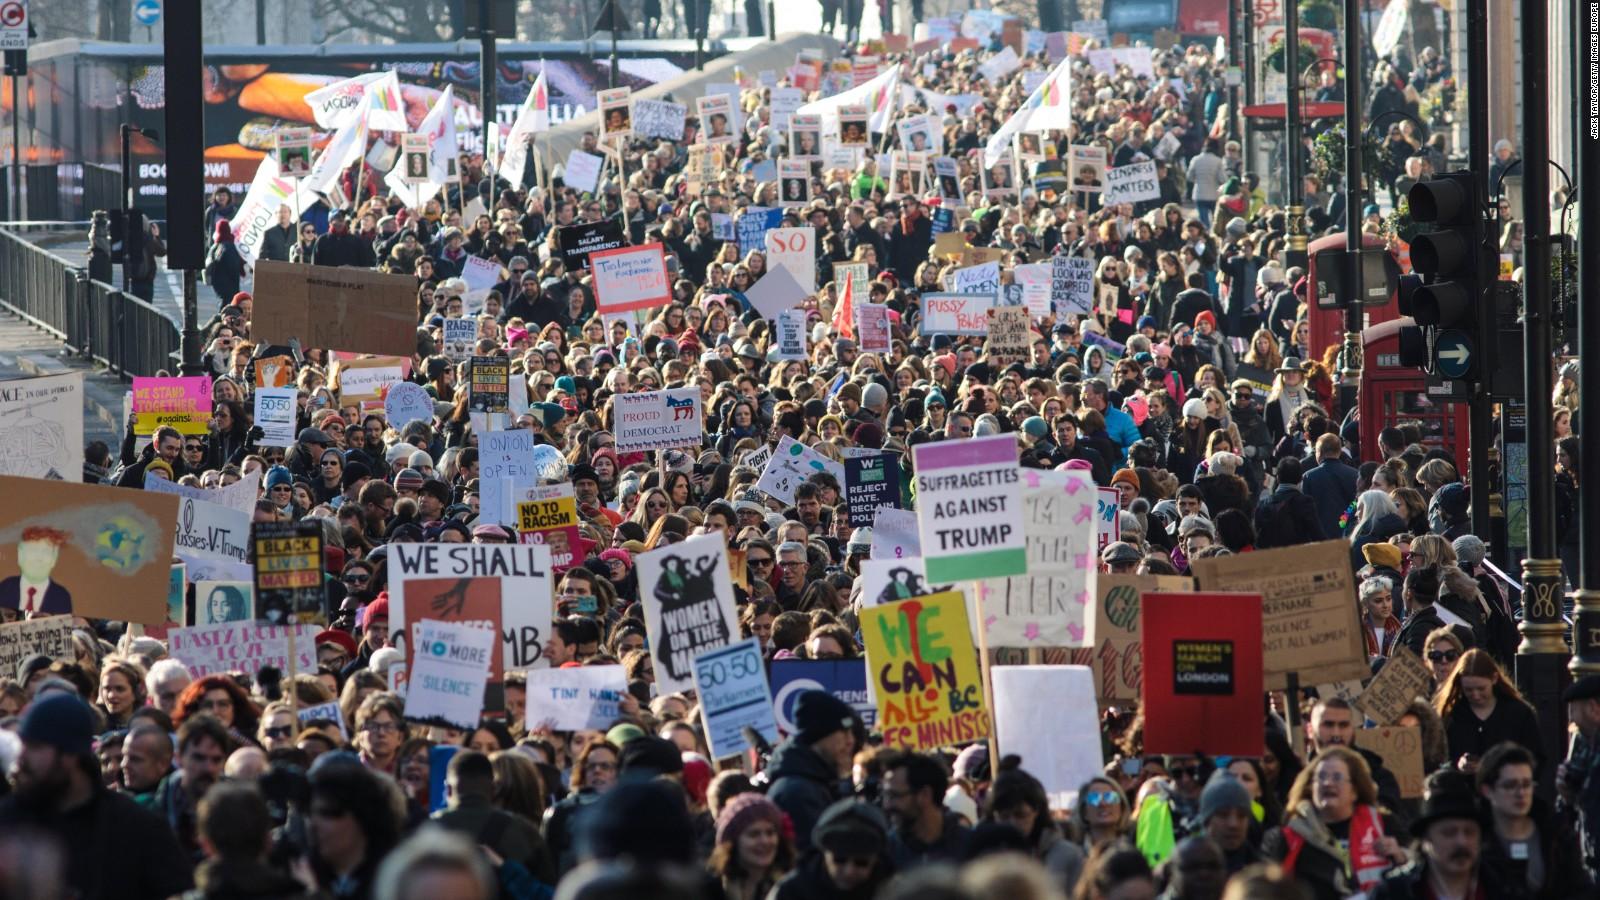 170121143229-womens-march-london-0121-fu